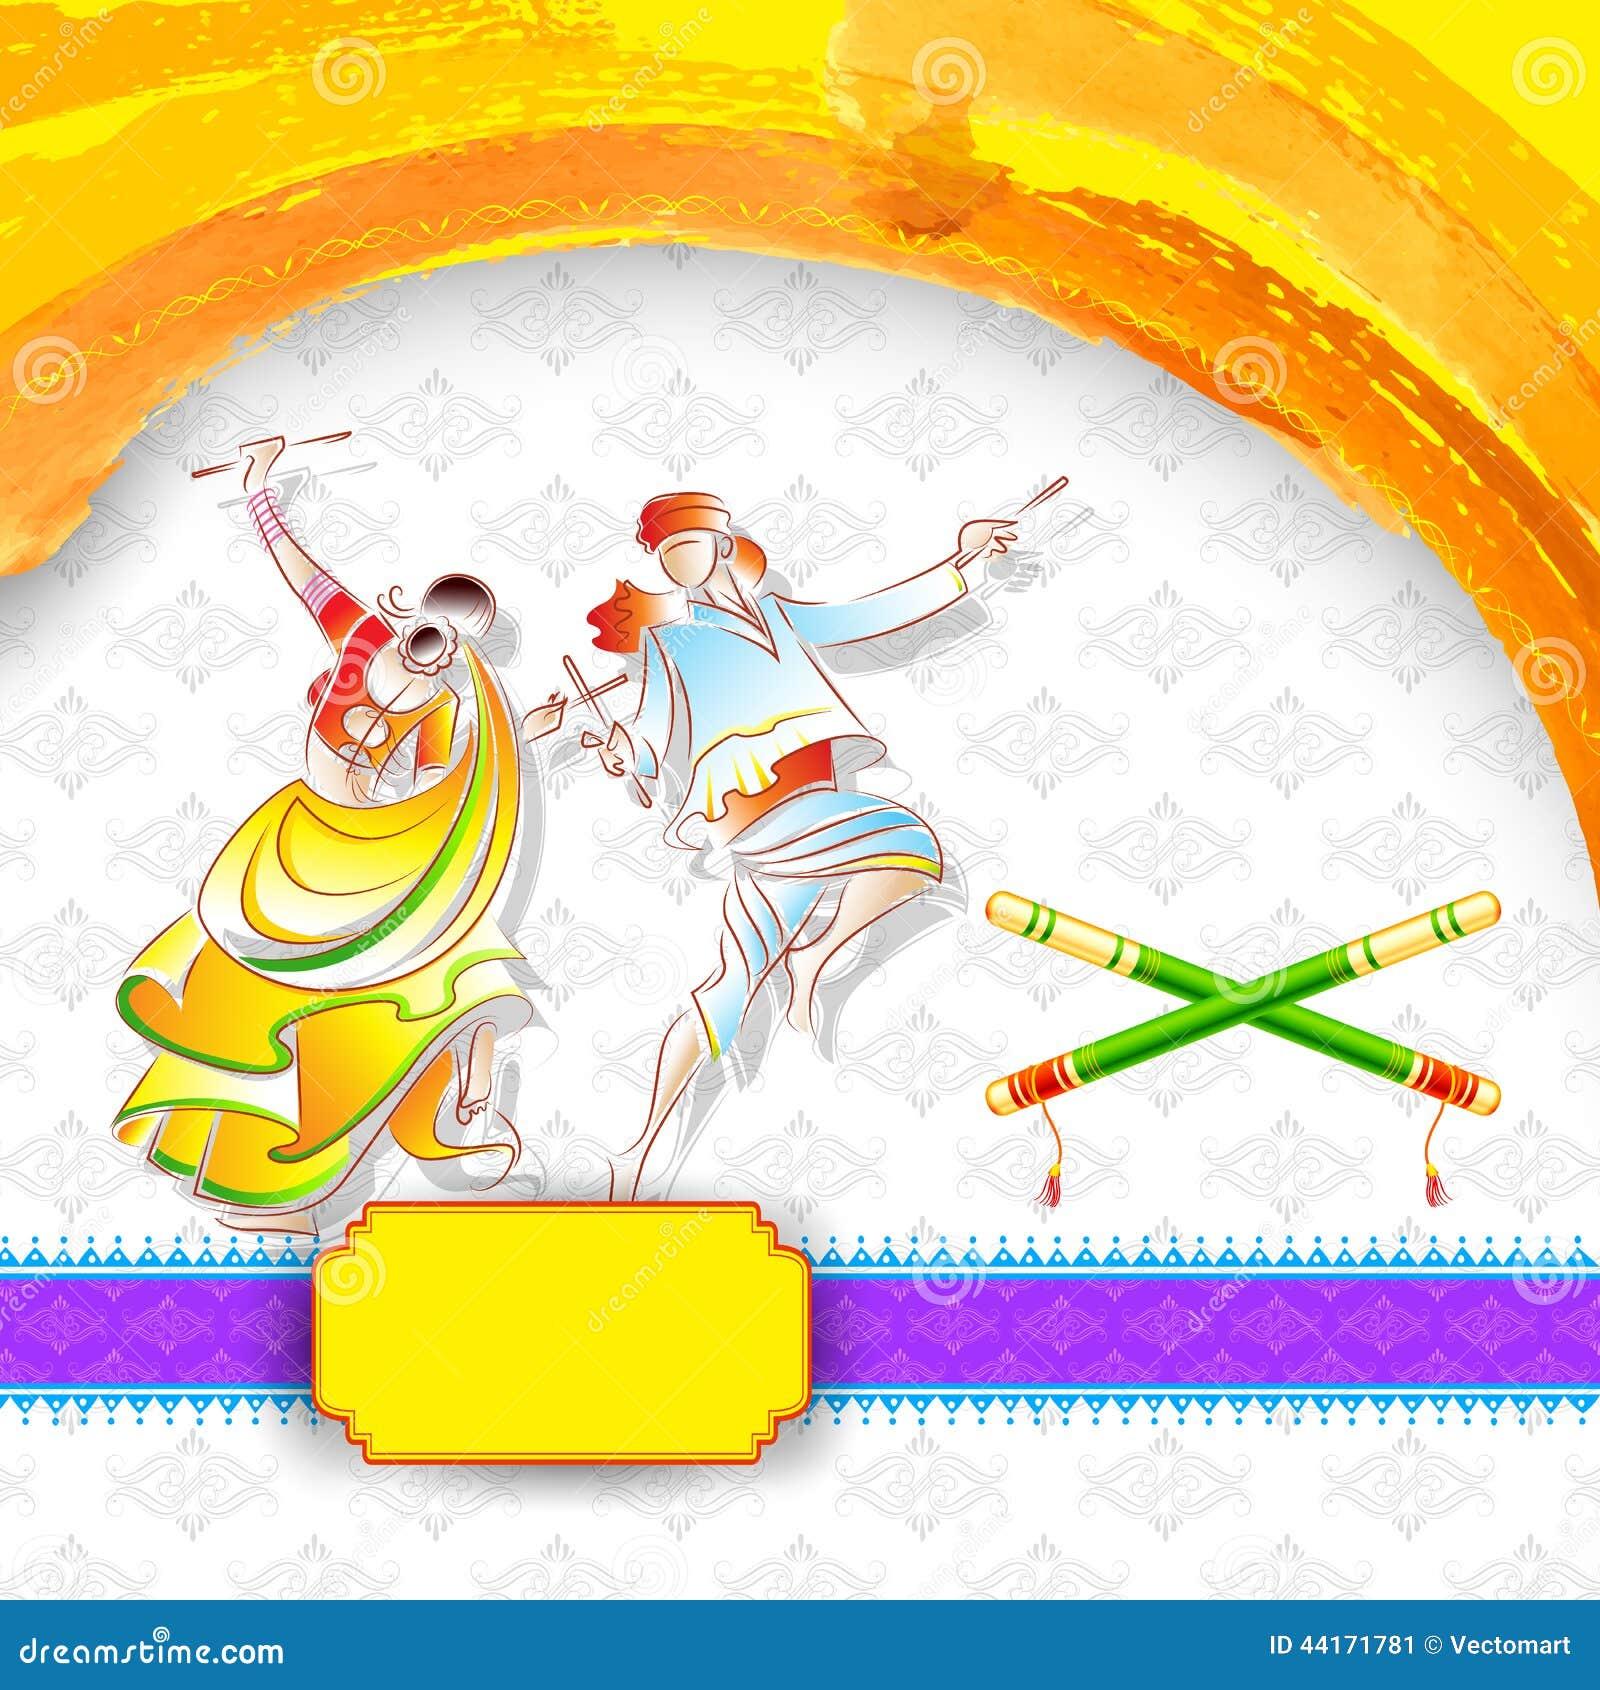 dandiya night poster stock vector illustration of girl